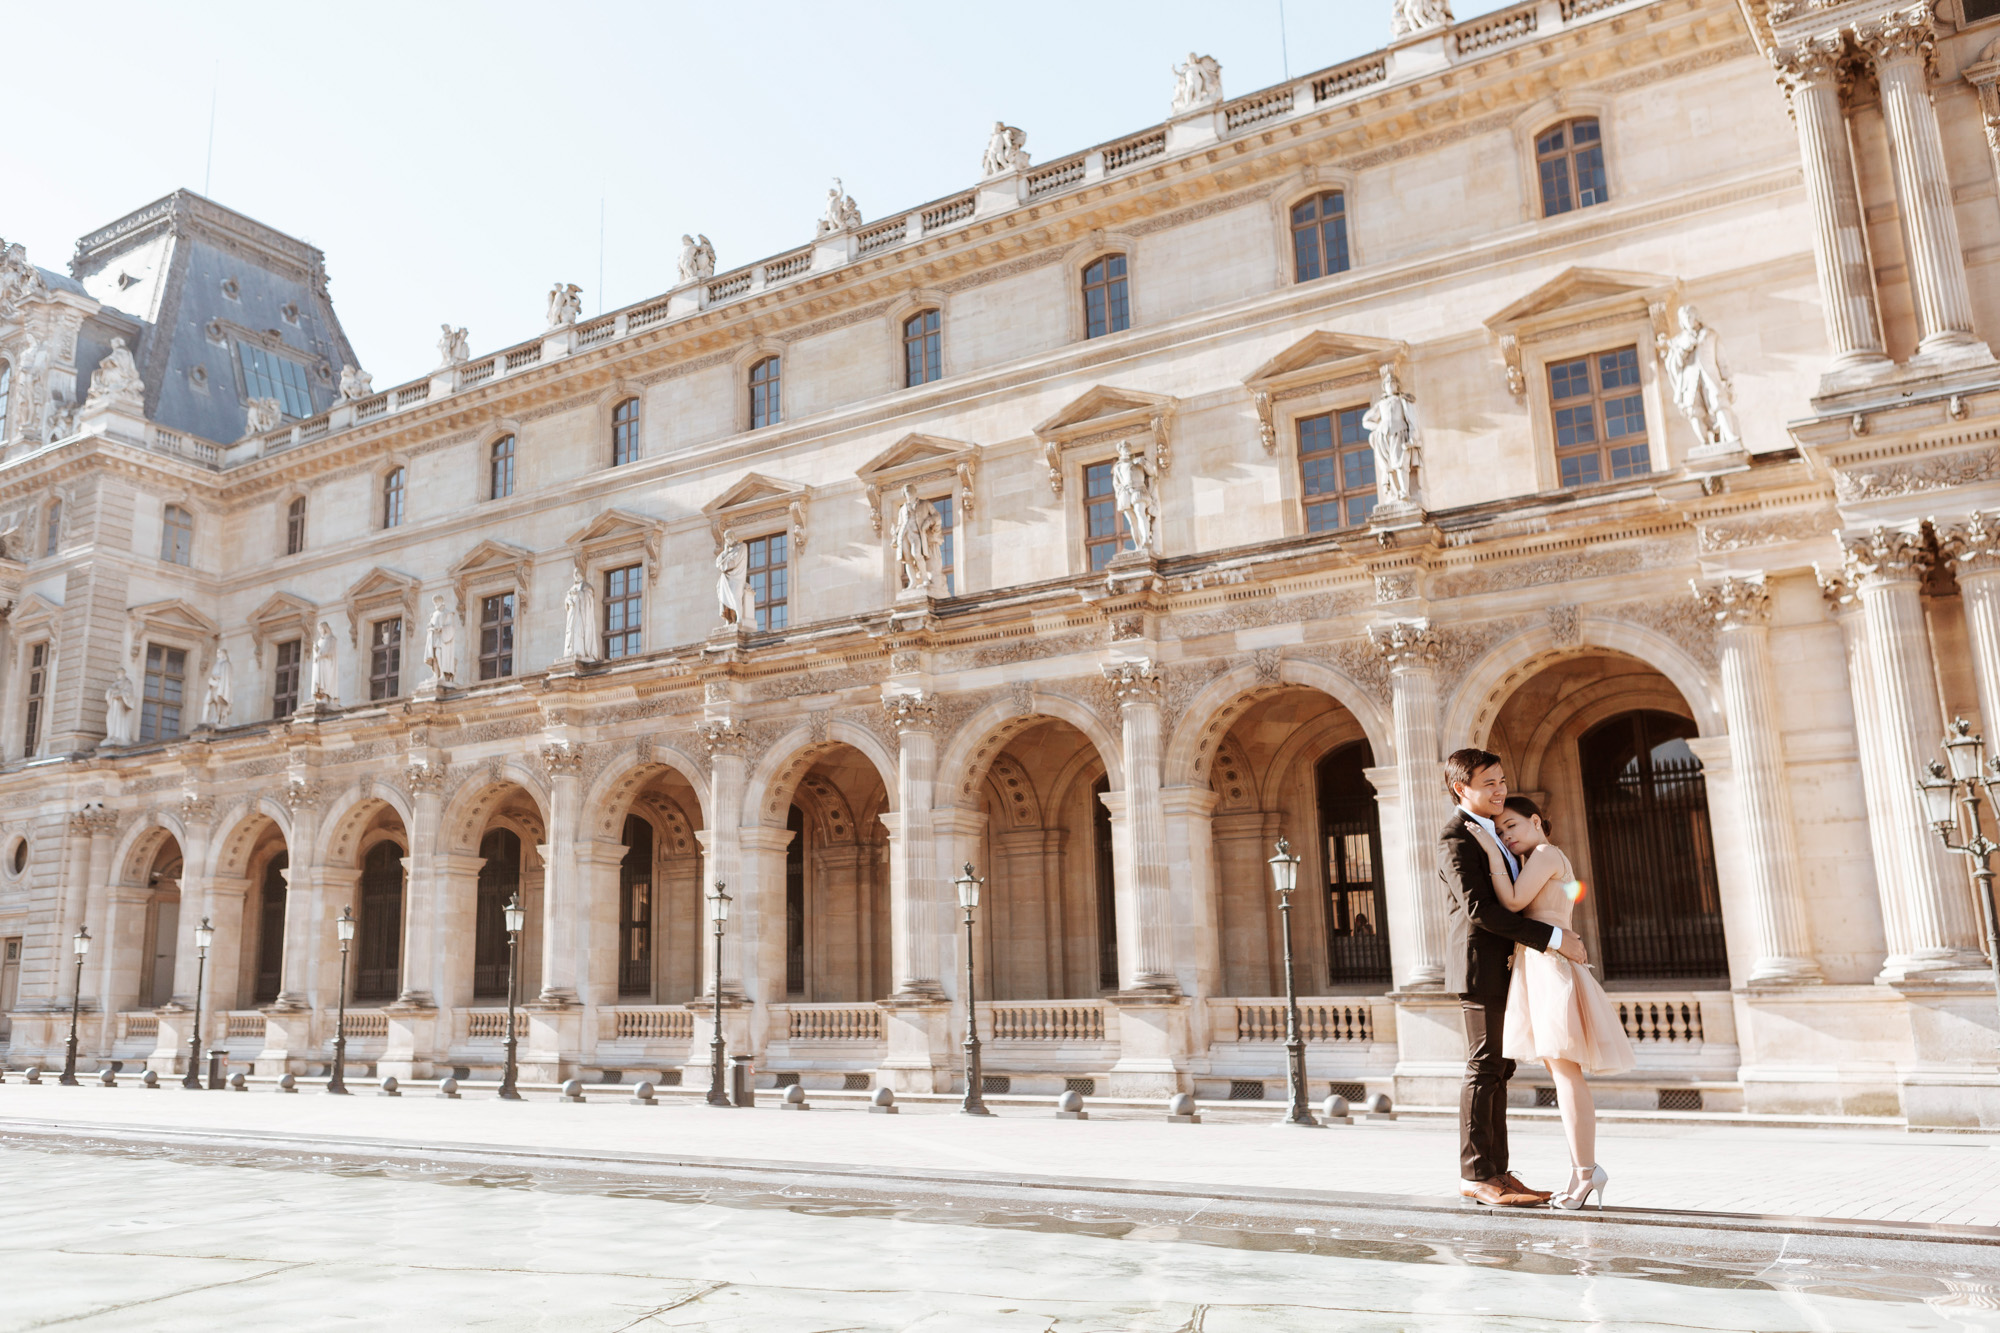 Pre-wedding couple portrait at the Louvre Museum courtyard at sunrise captured by Paris Photographer Federico Guendel